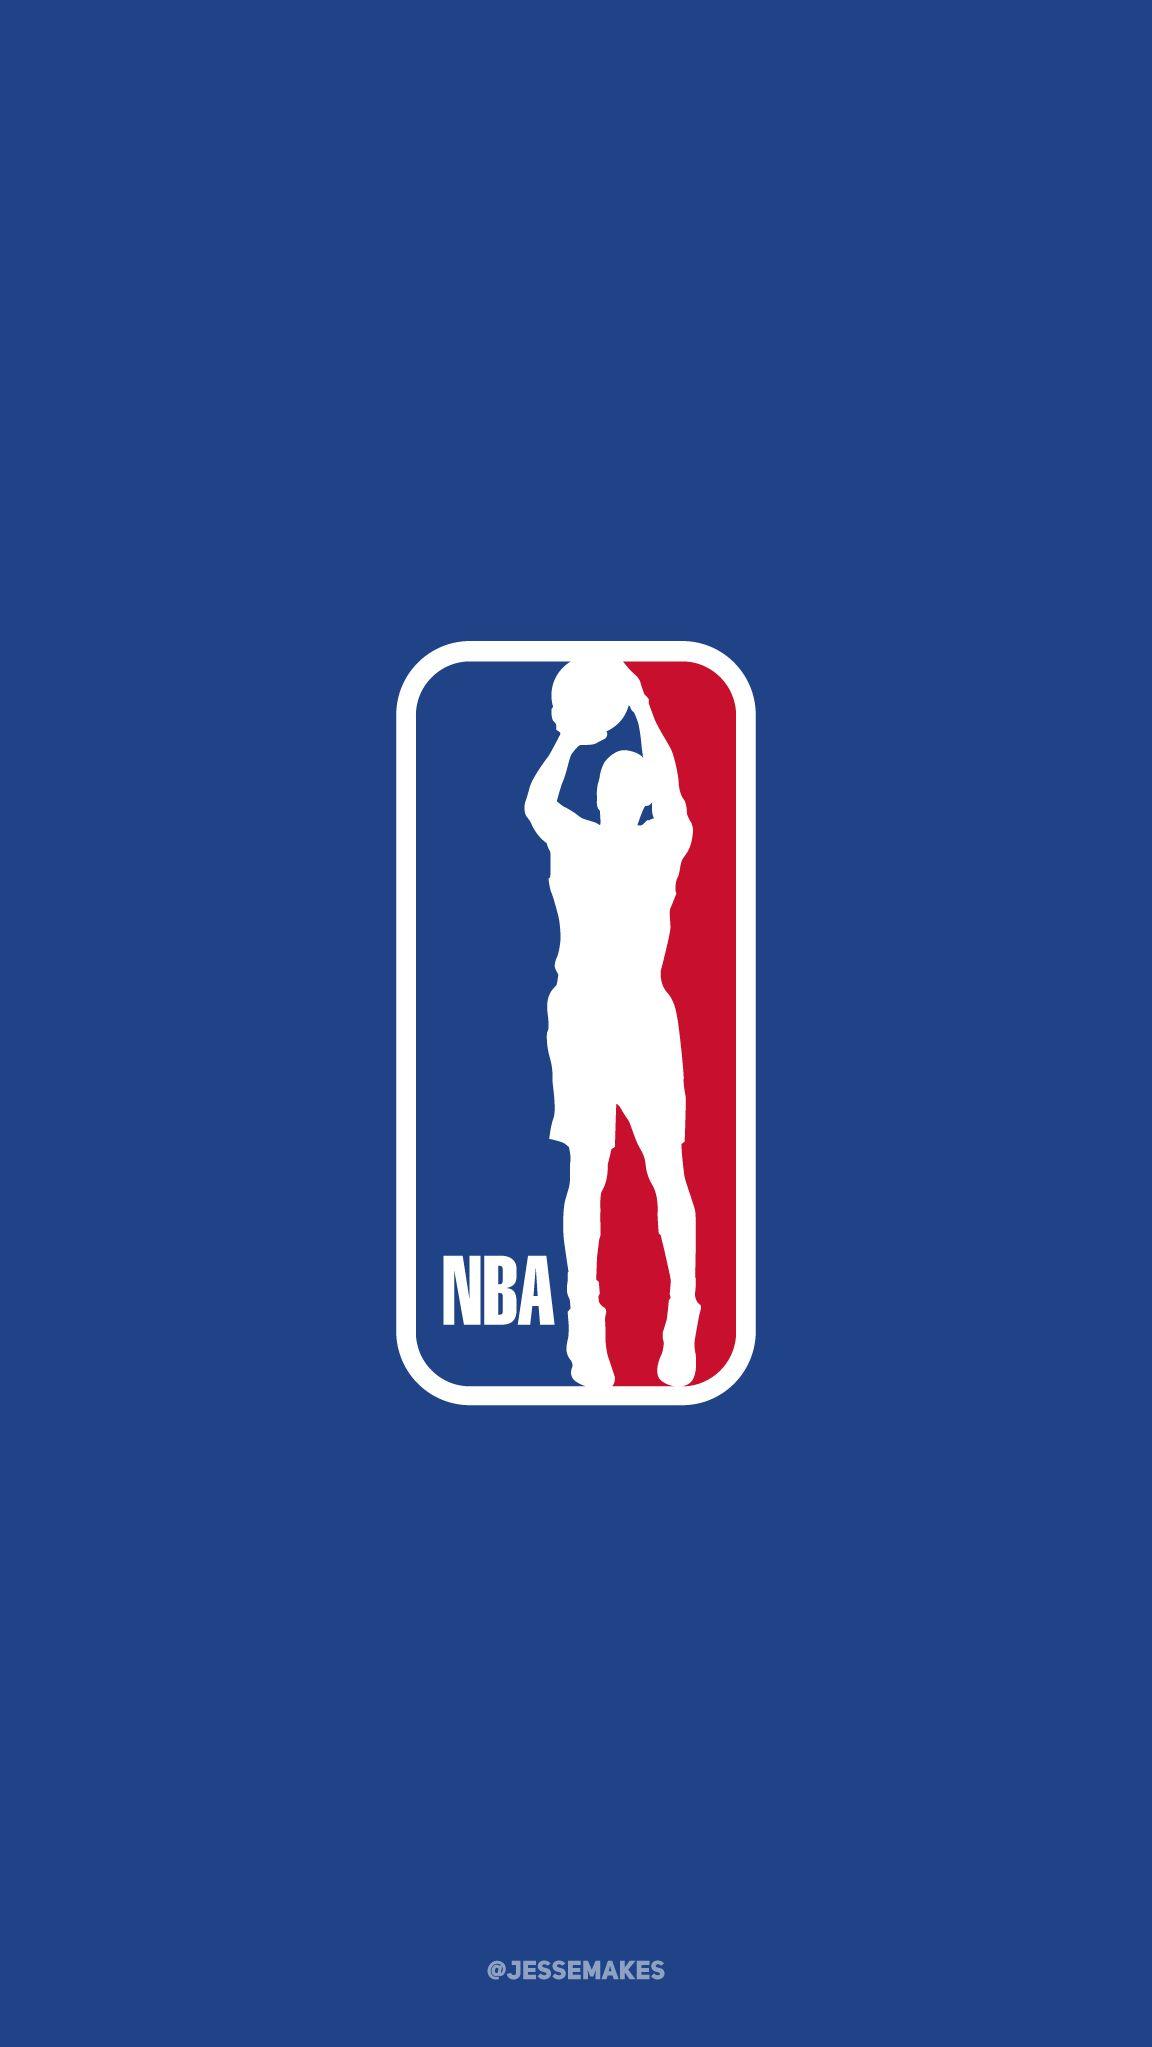 Steph Curry As The Nba Logo Nba Logo Nba Wallpapers Nba